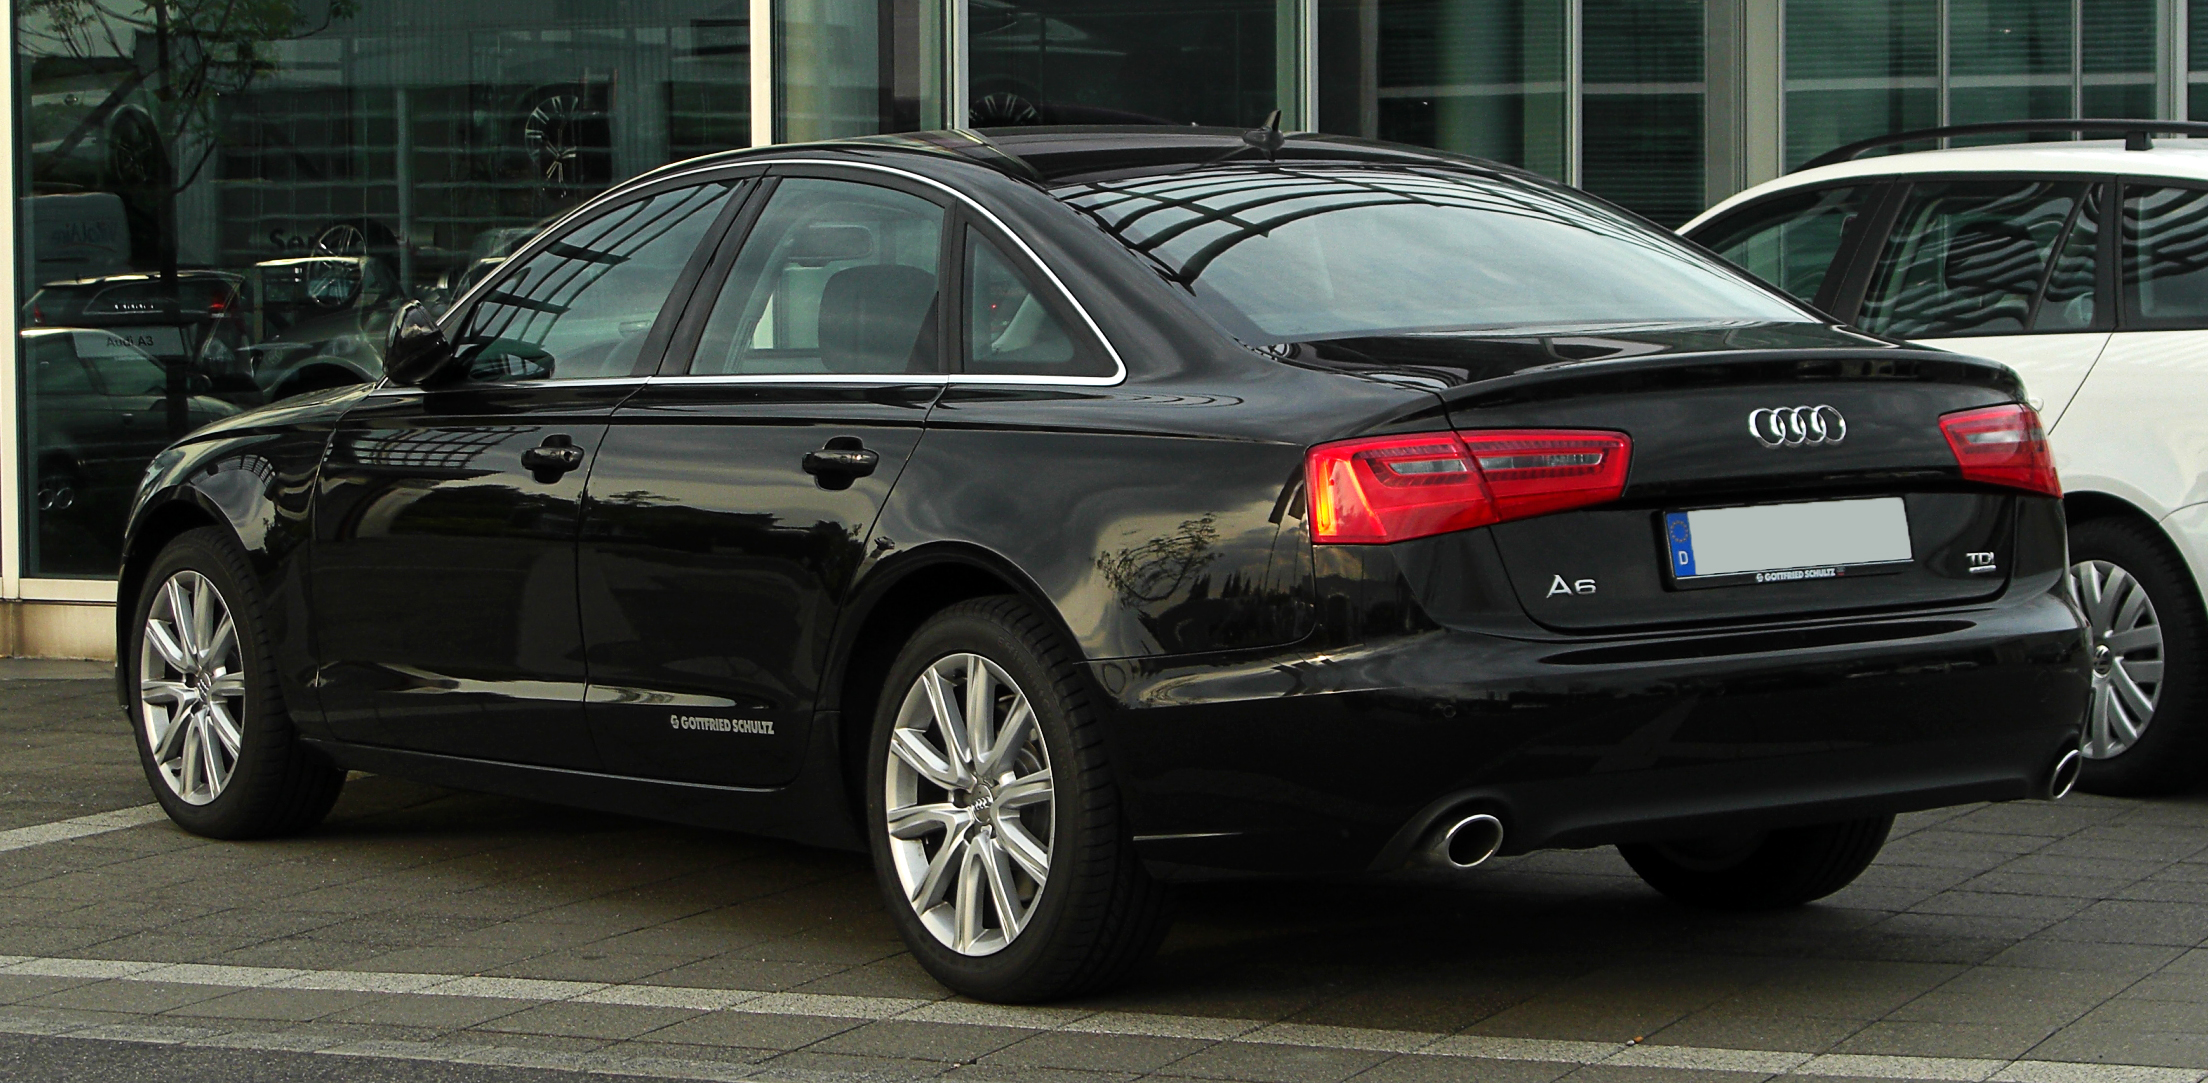 File Audi A6 3 0 Tdi Quattro C7 Heckansicht 1 13